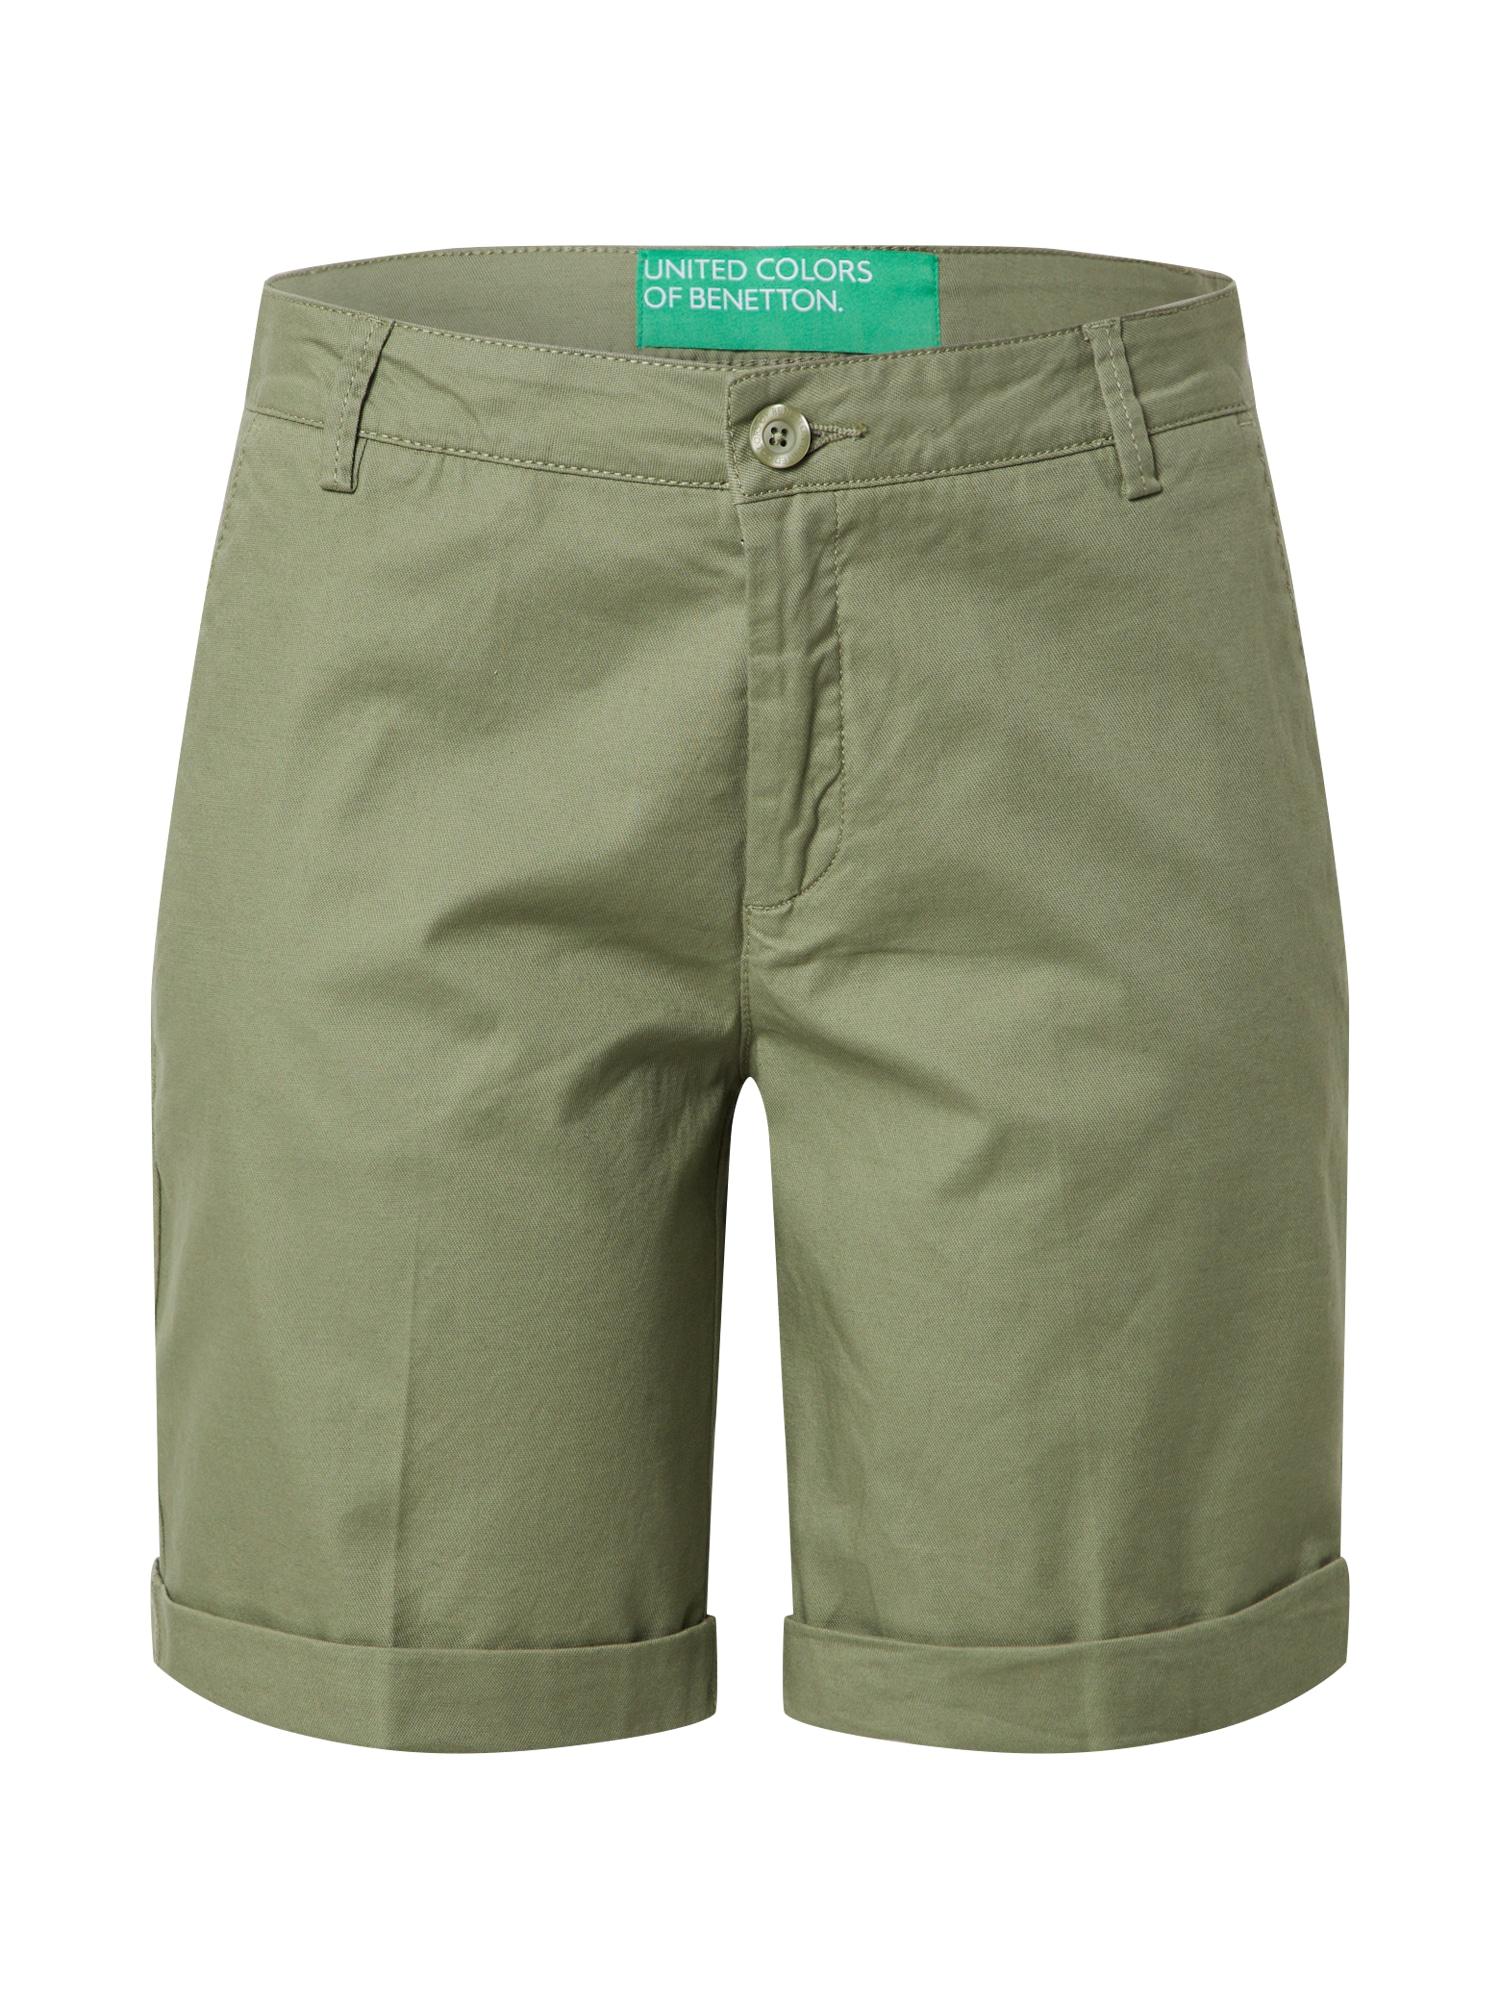 UNITED COLORS OF BENETTON Chino kalhoty  olivová